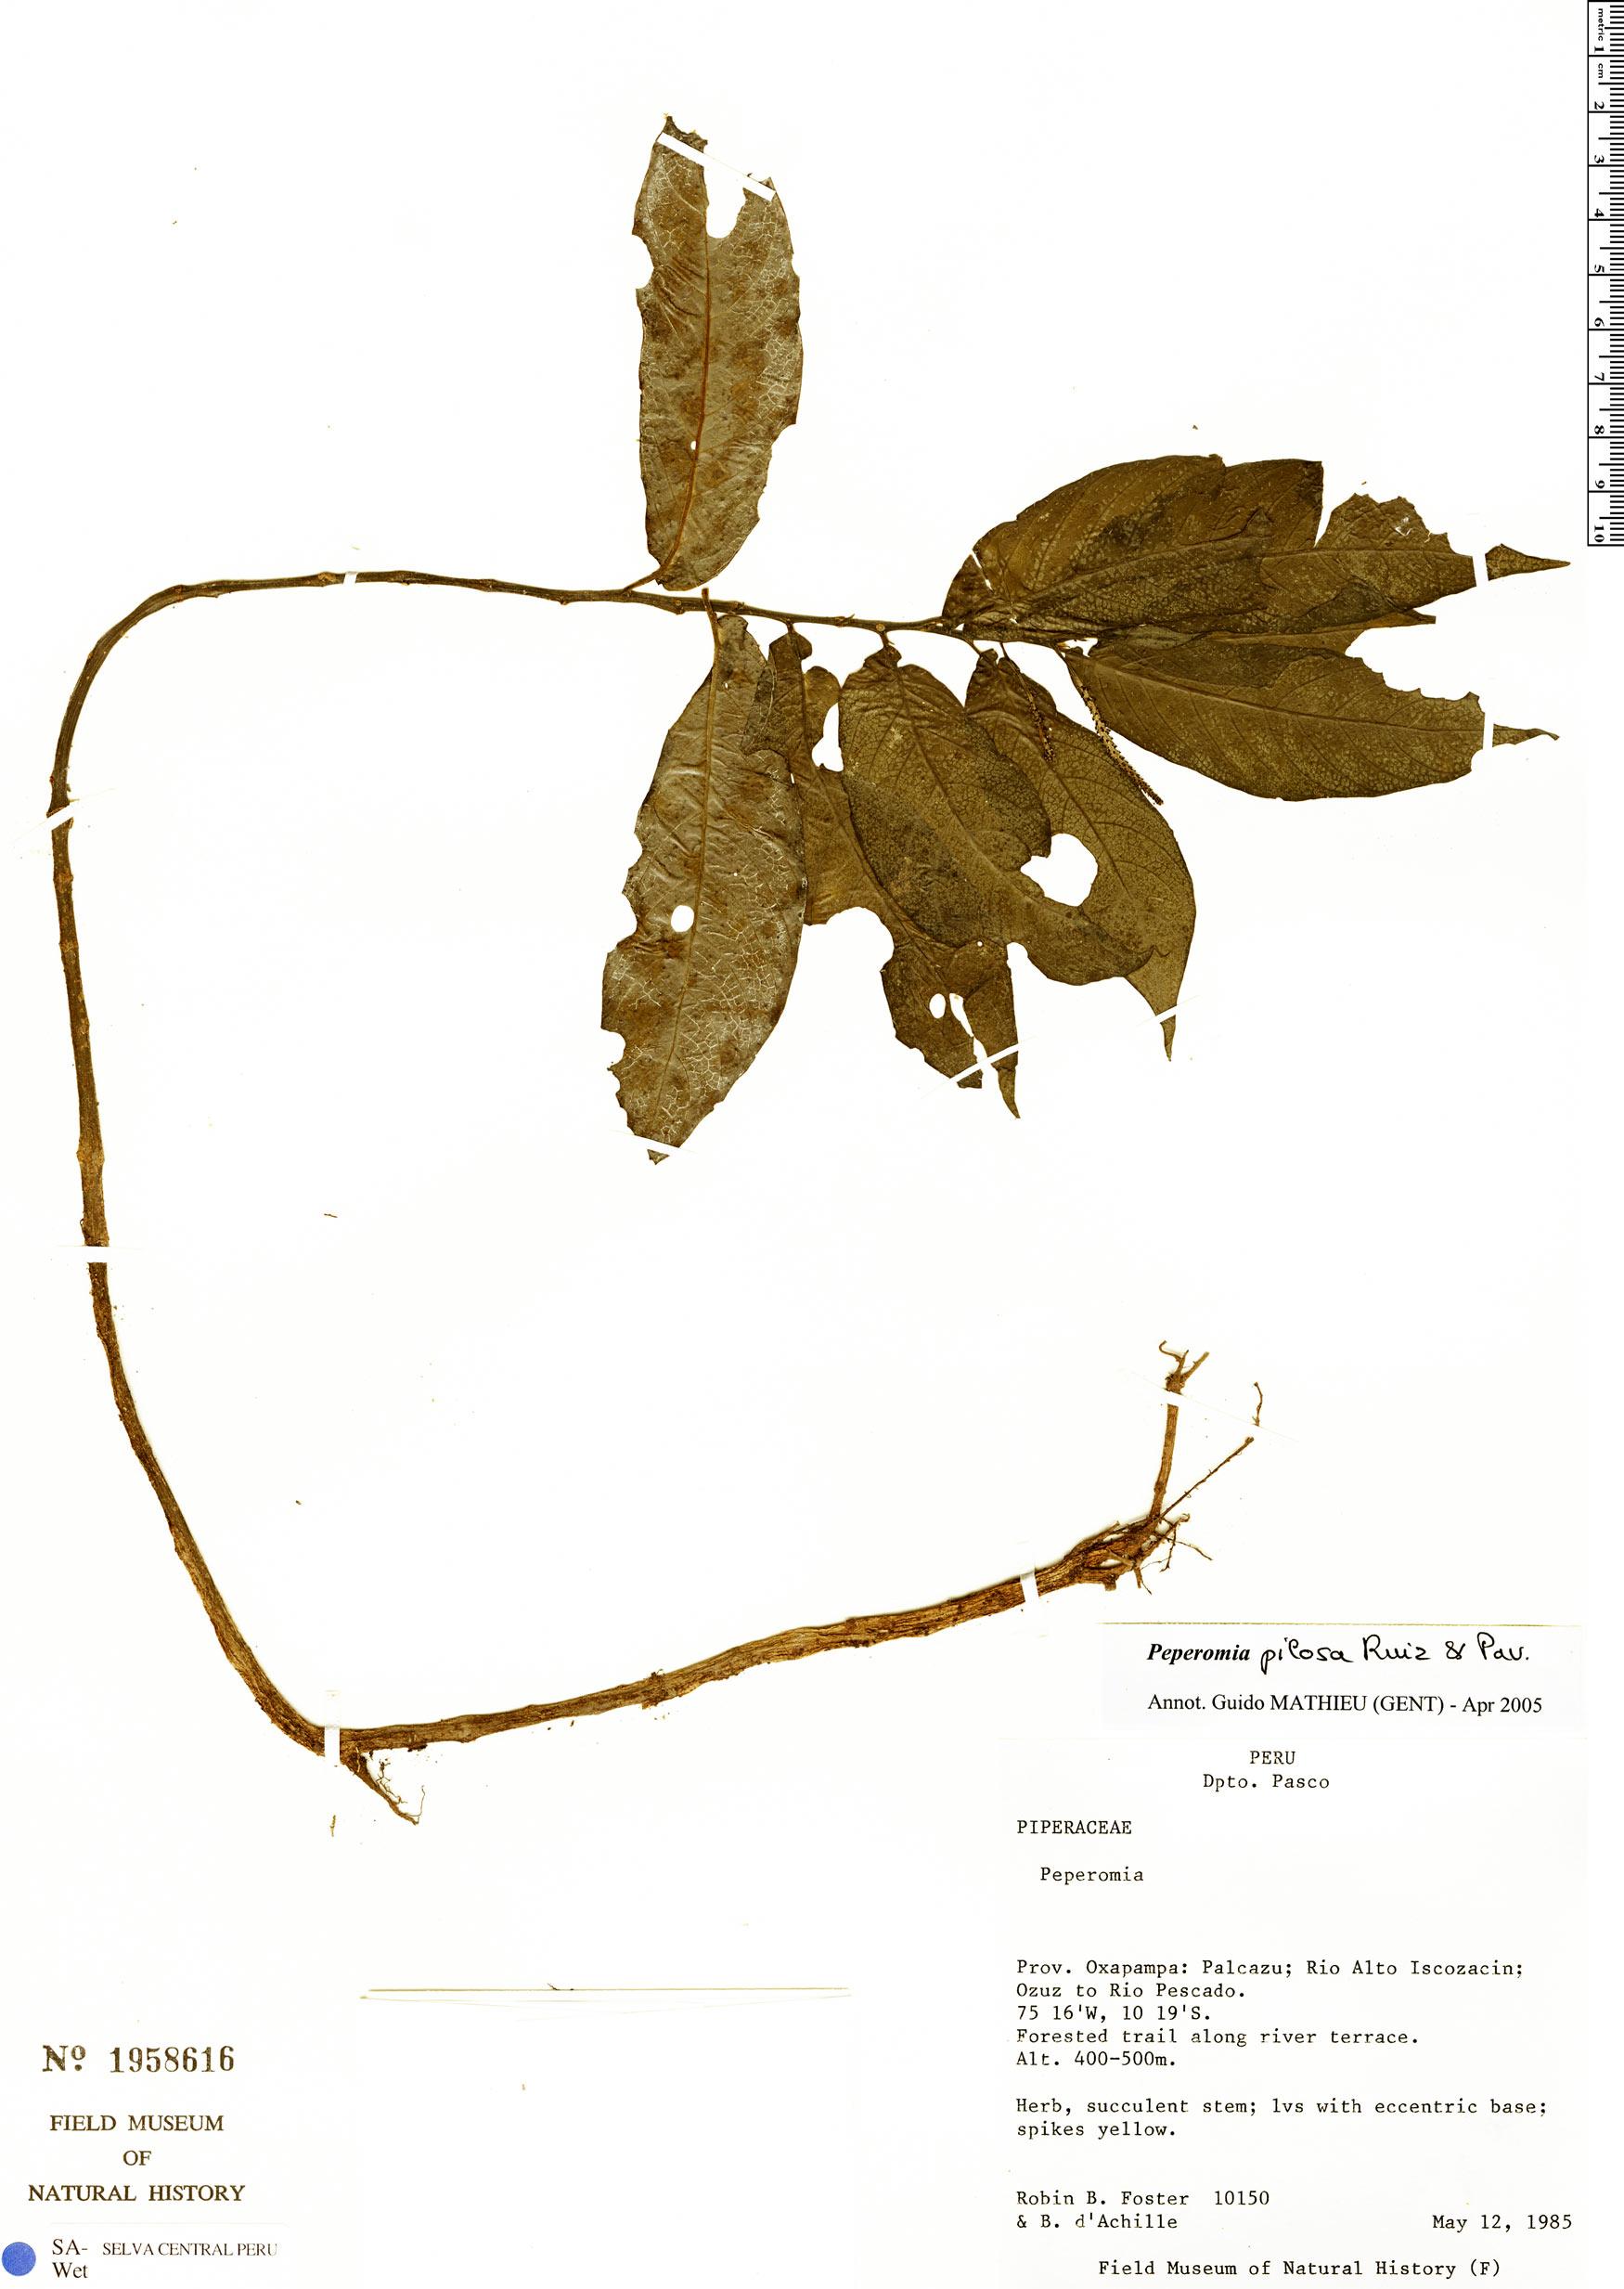 Specimen: Peperomia pilosa